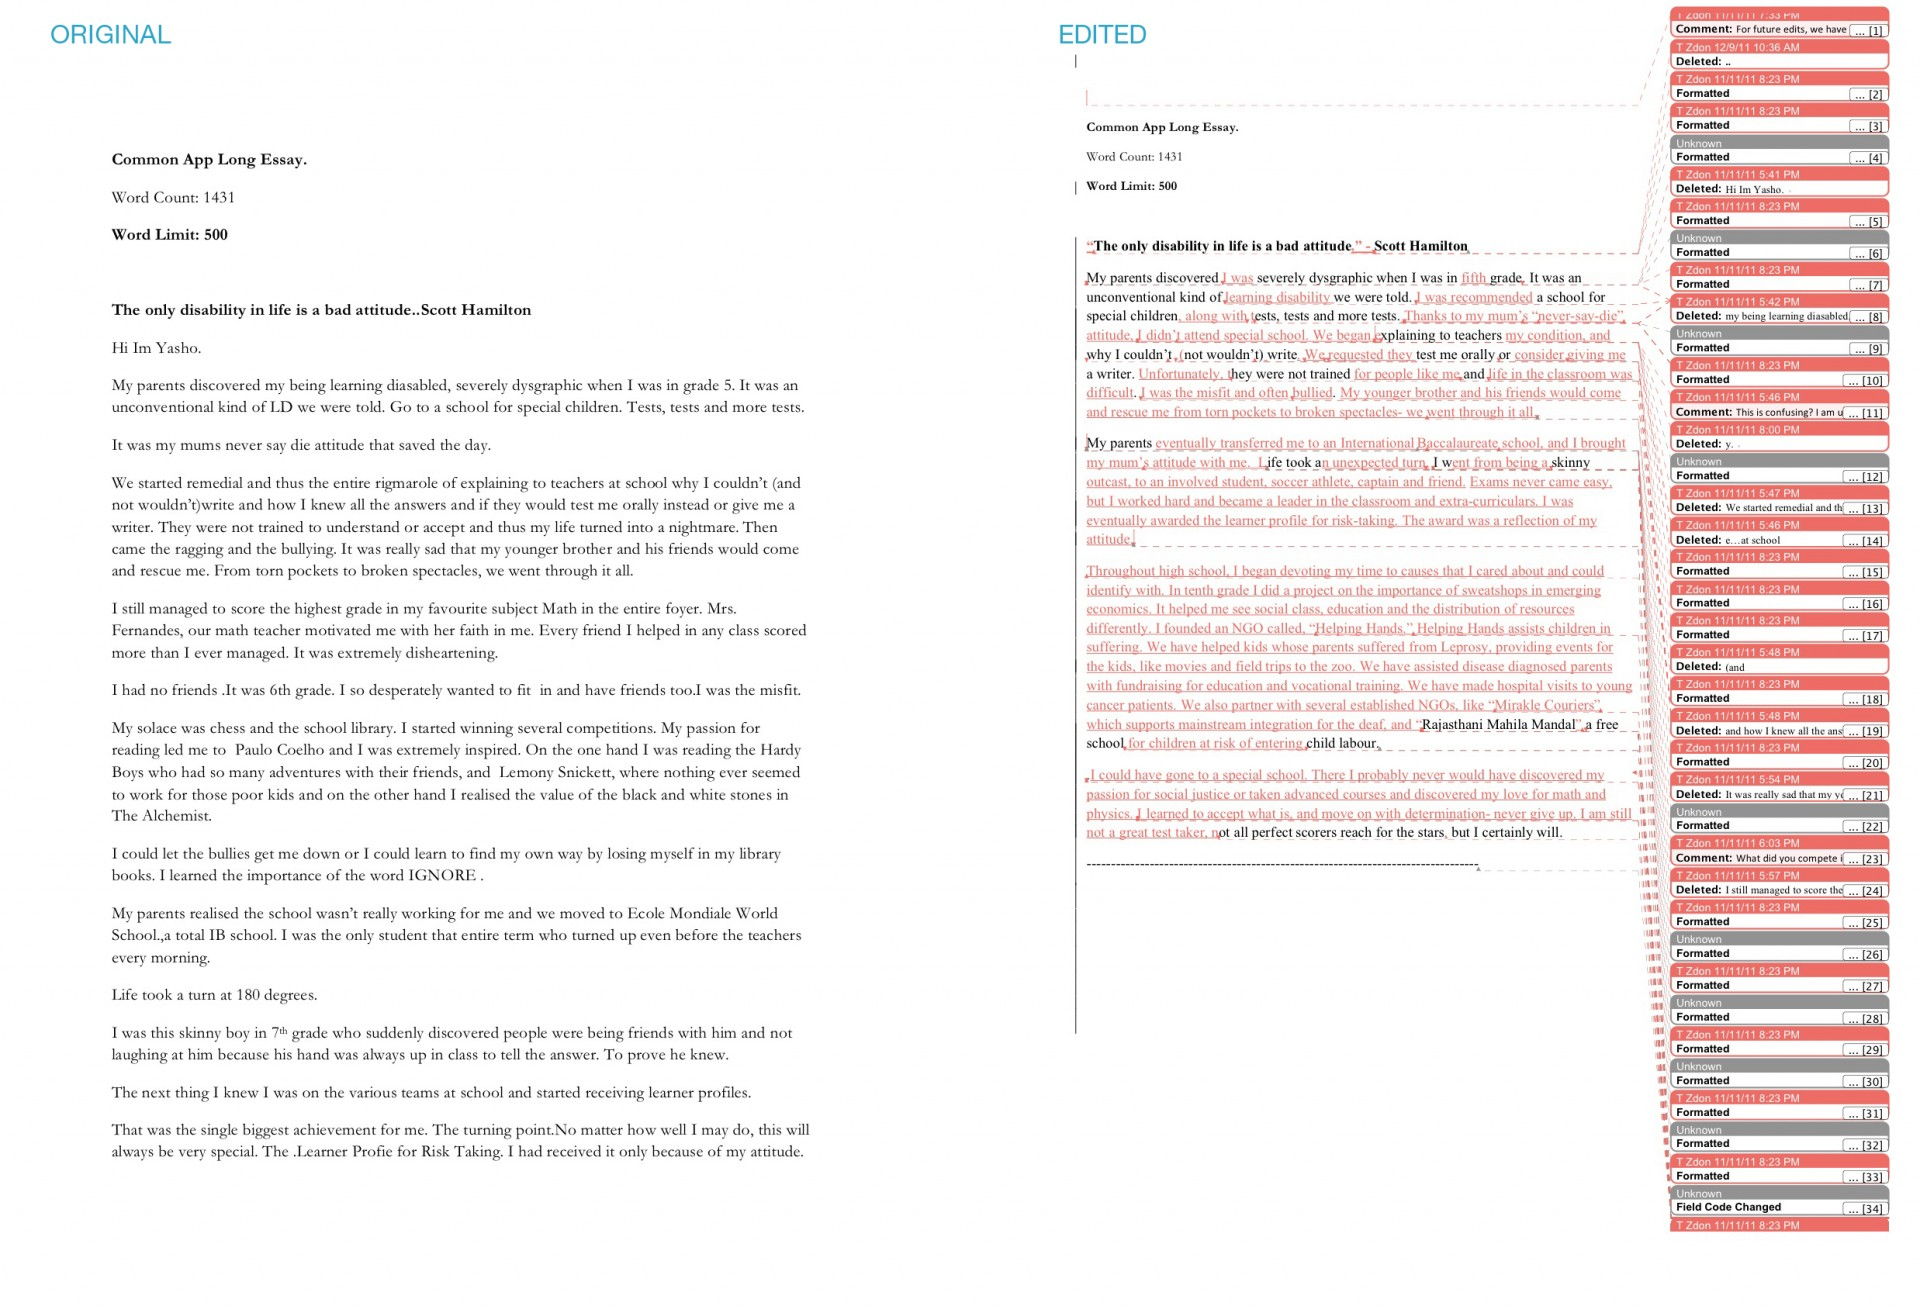 006 Common Application Essays Beautiful Essay Examples App Ideas 2016 Cornell 2017 1920